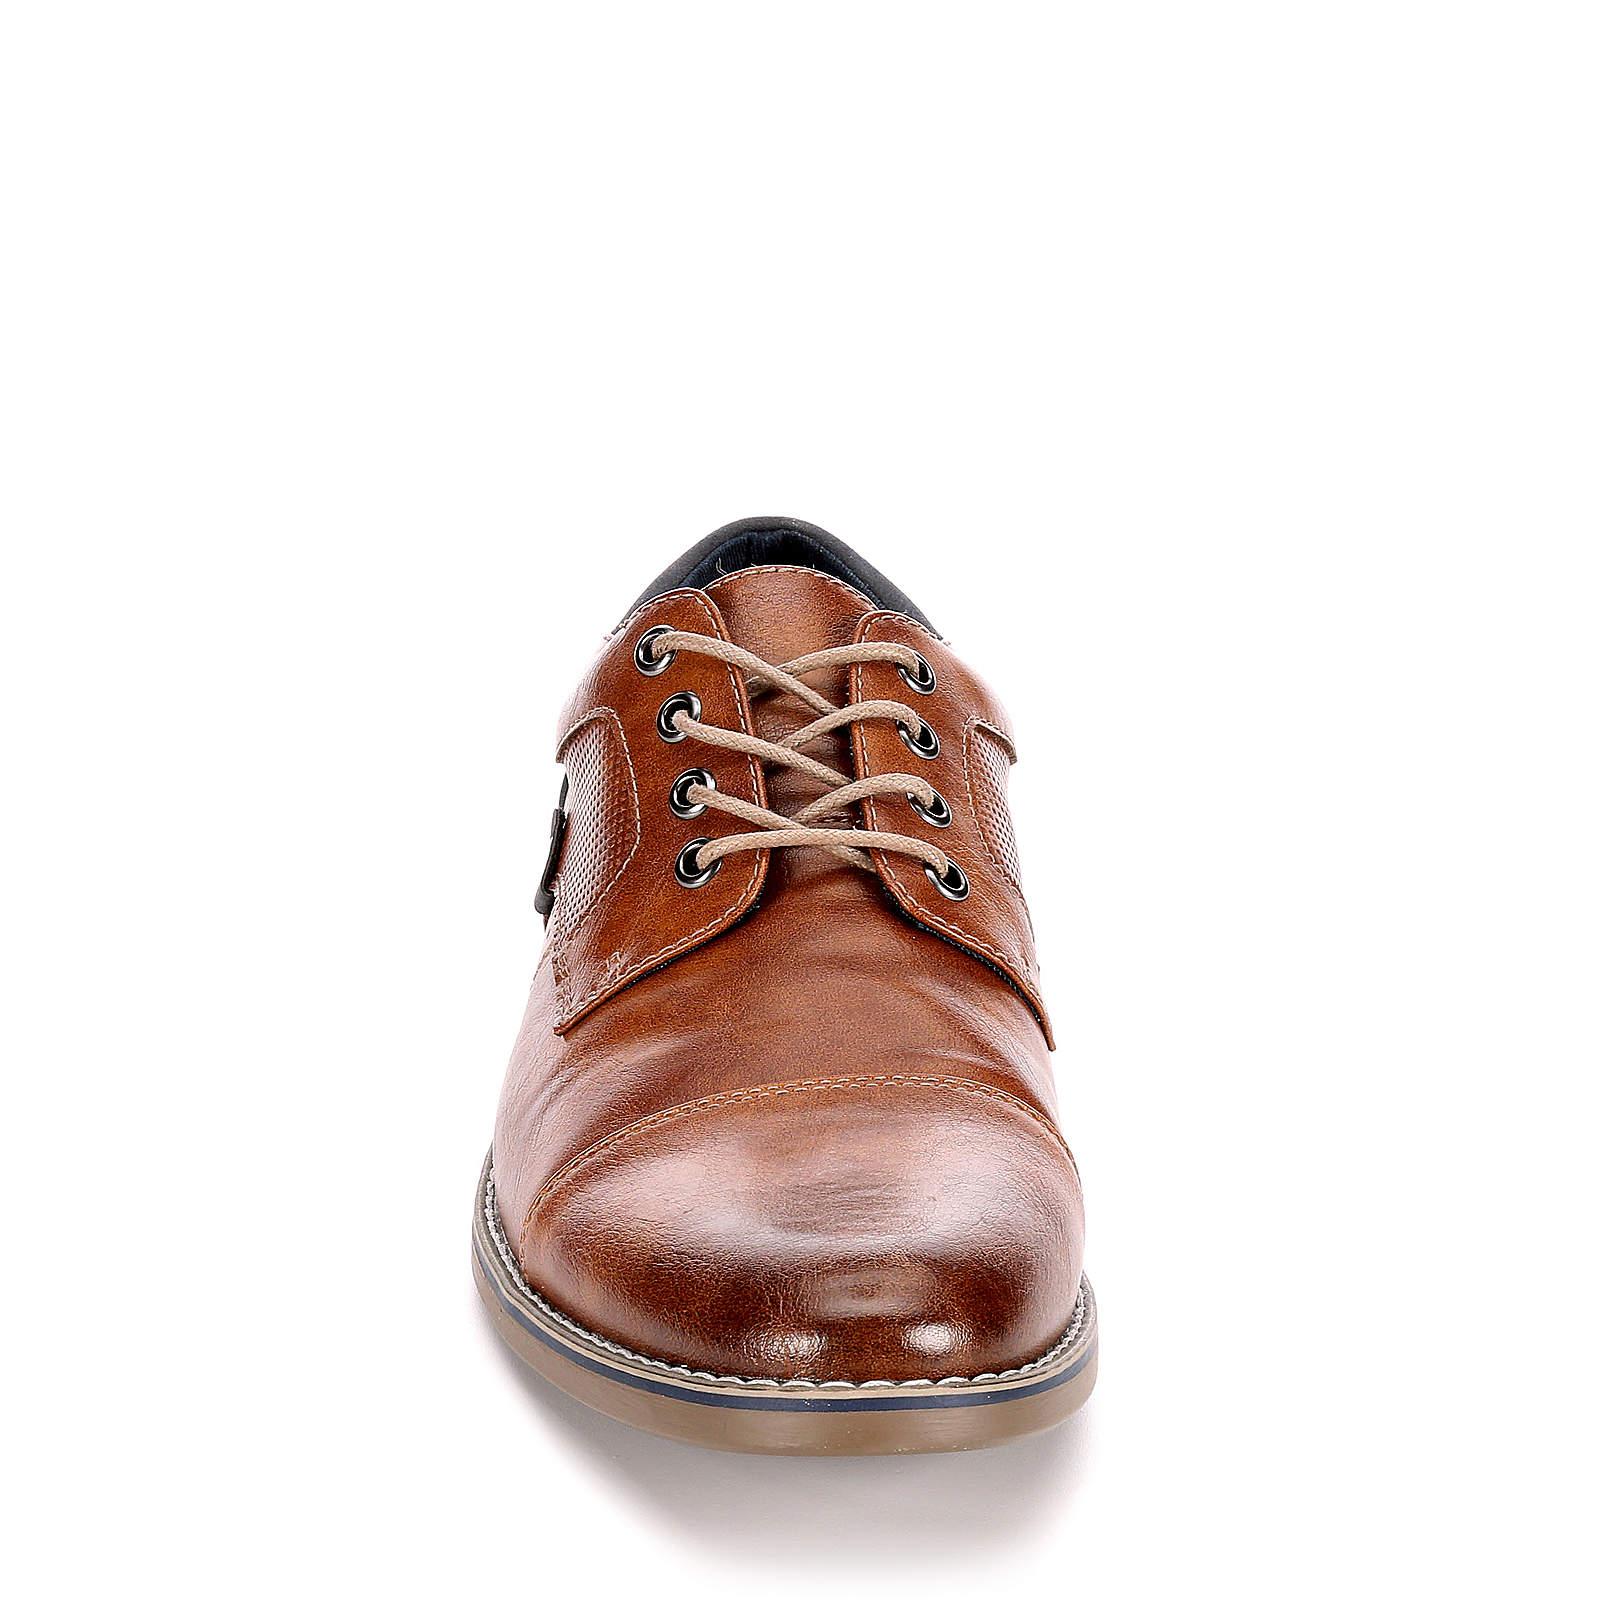 Restoration Mens Justin Lace Up Cap Toe Oxford Shoes